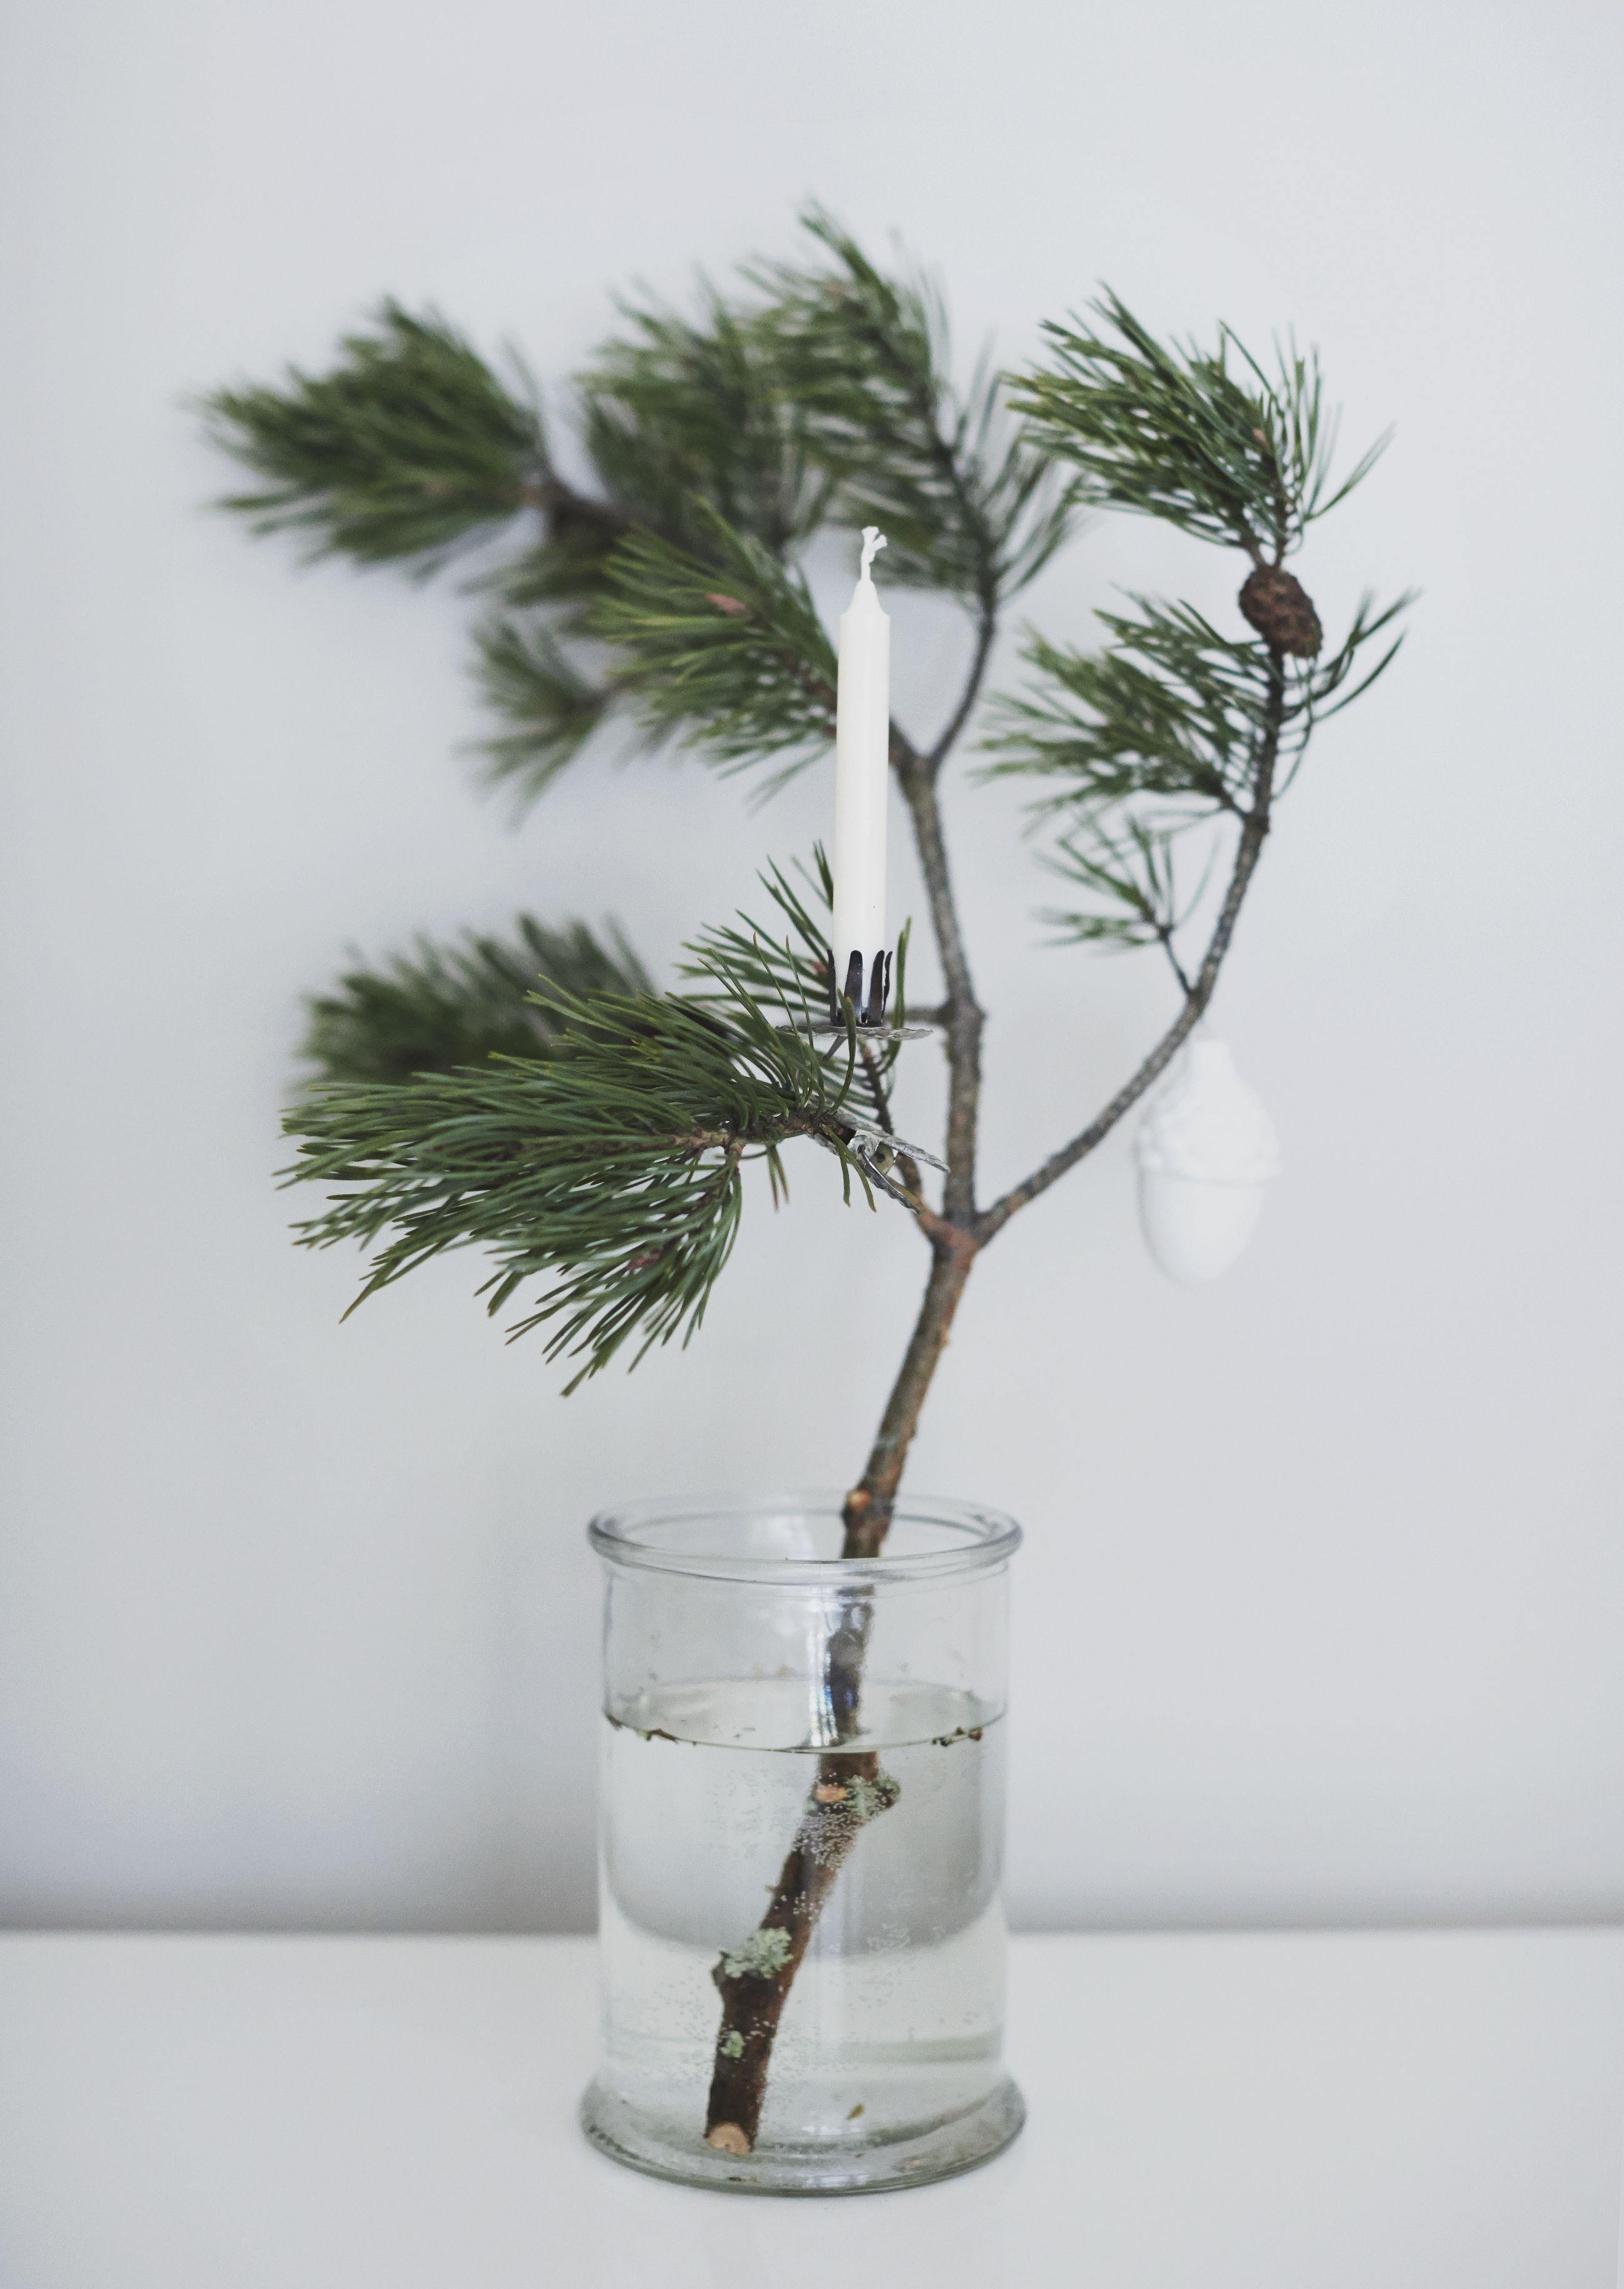 Joulu | Jul | Noel | Christmas Photo and styling: Riikka Kantinkoski wie wundervoll!